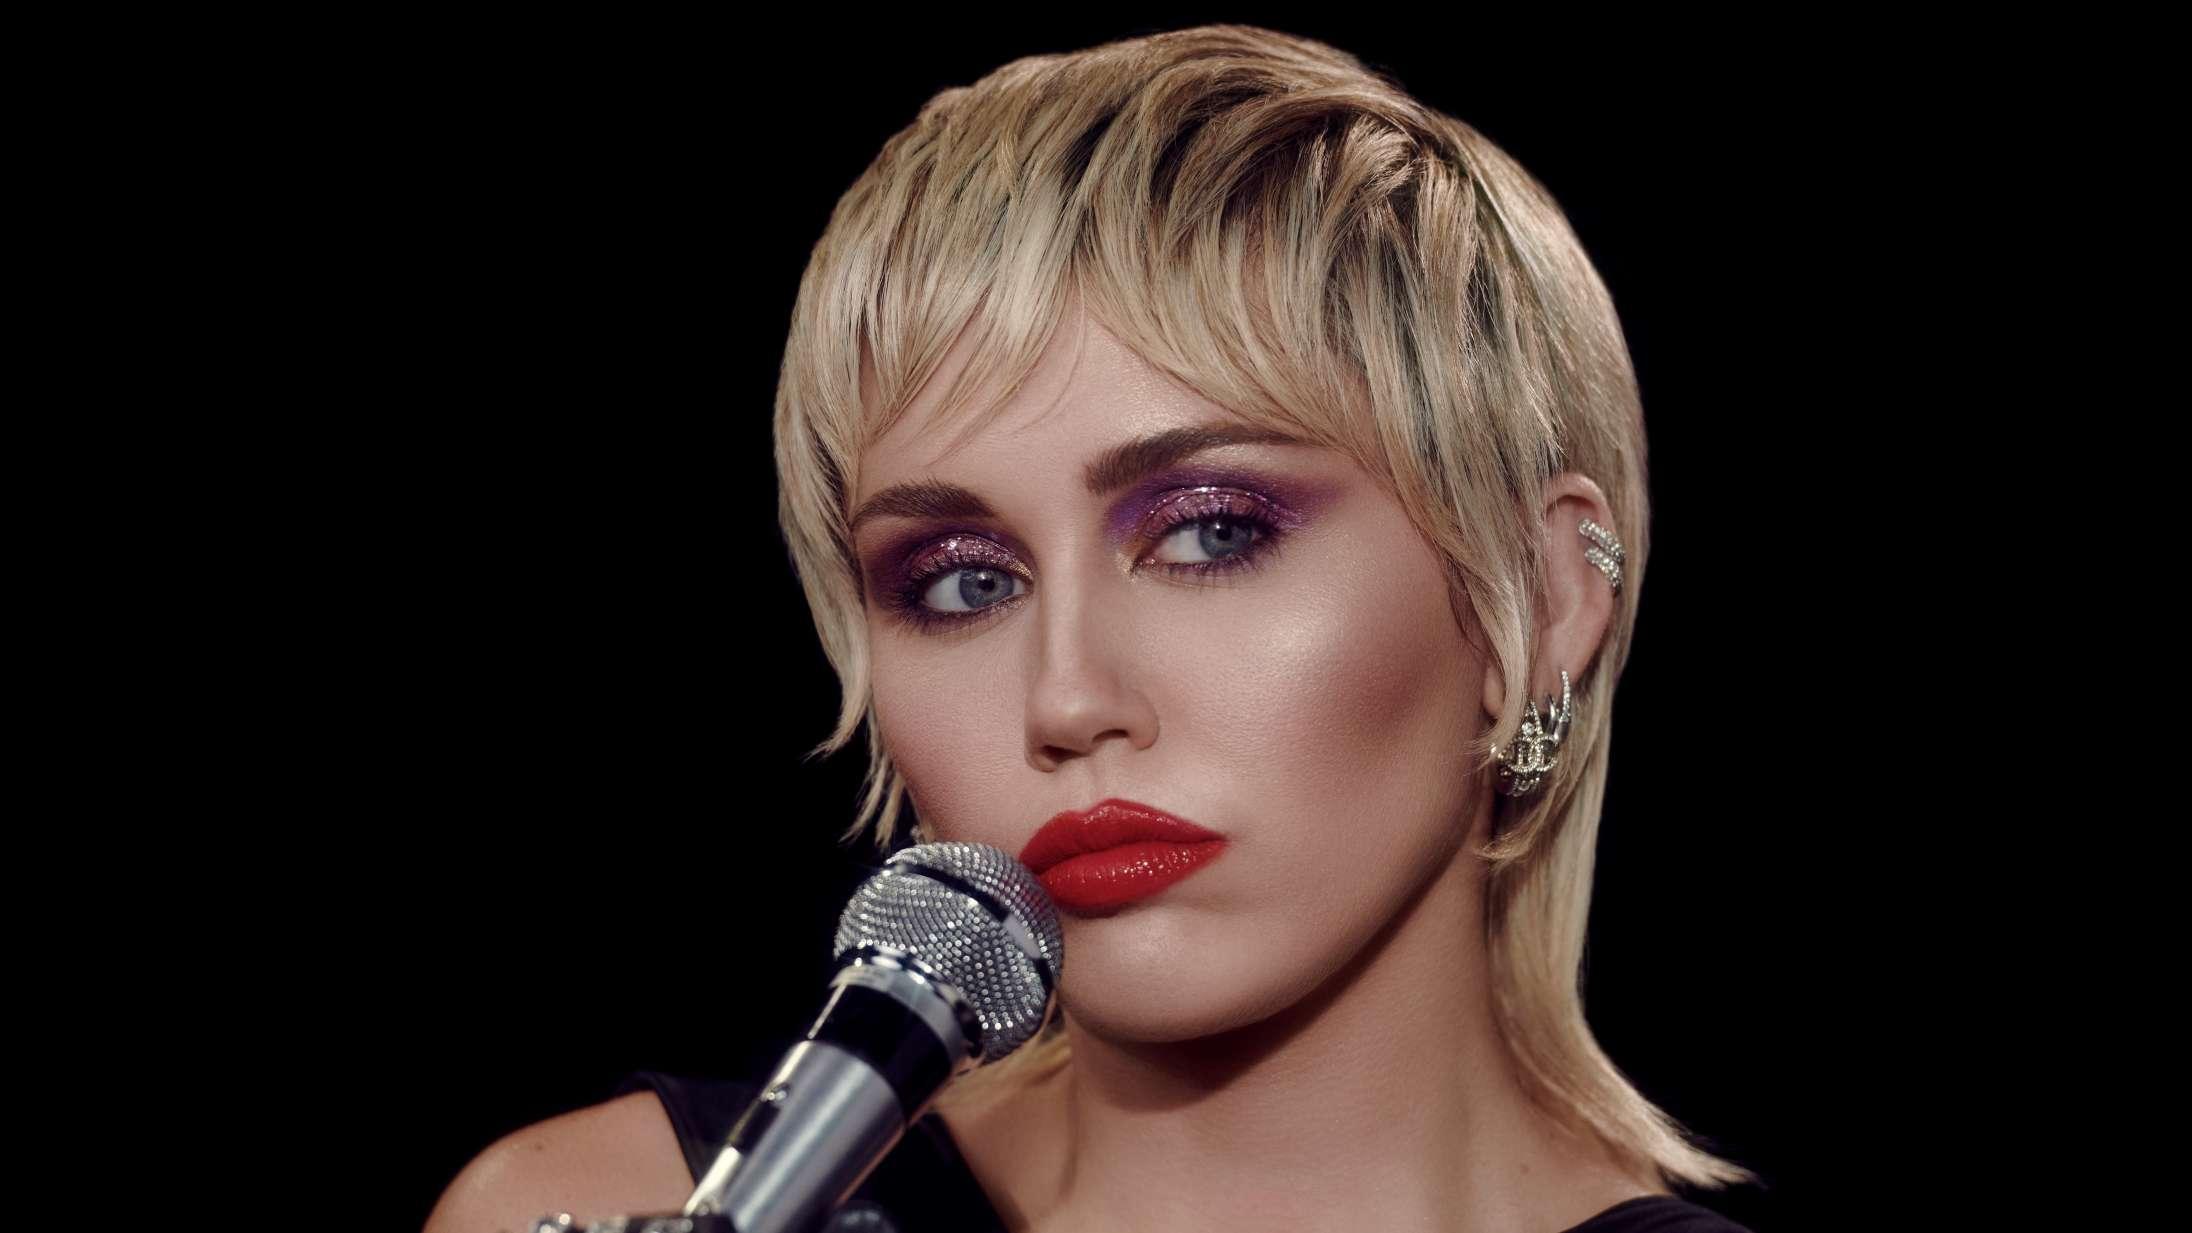 Miley Cyrus annoncerer nyt album